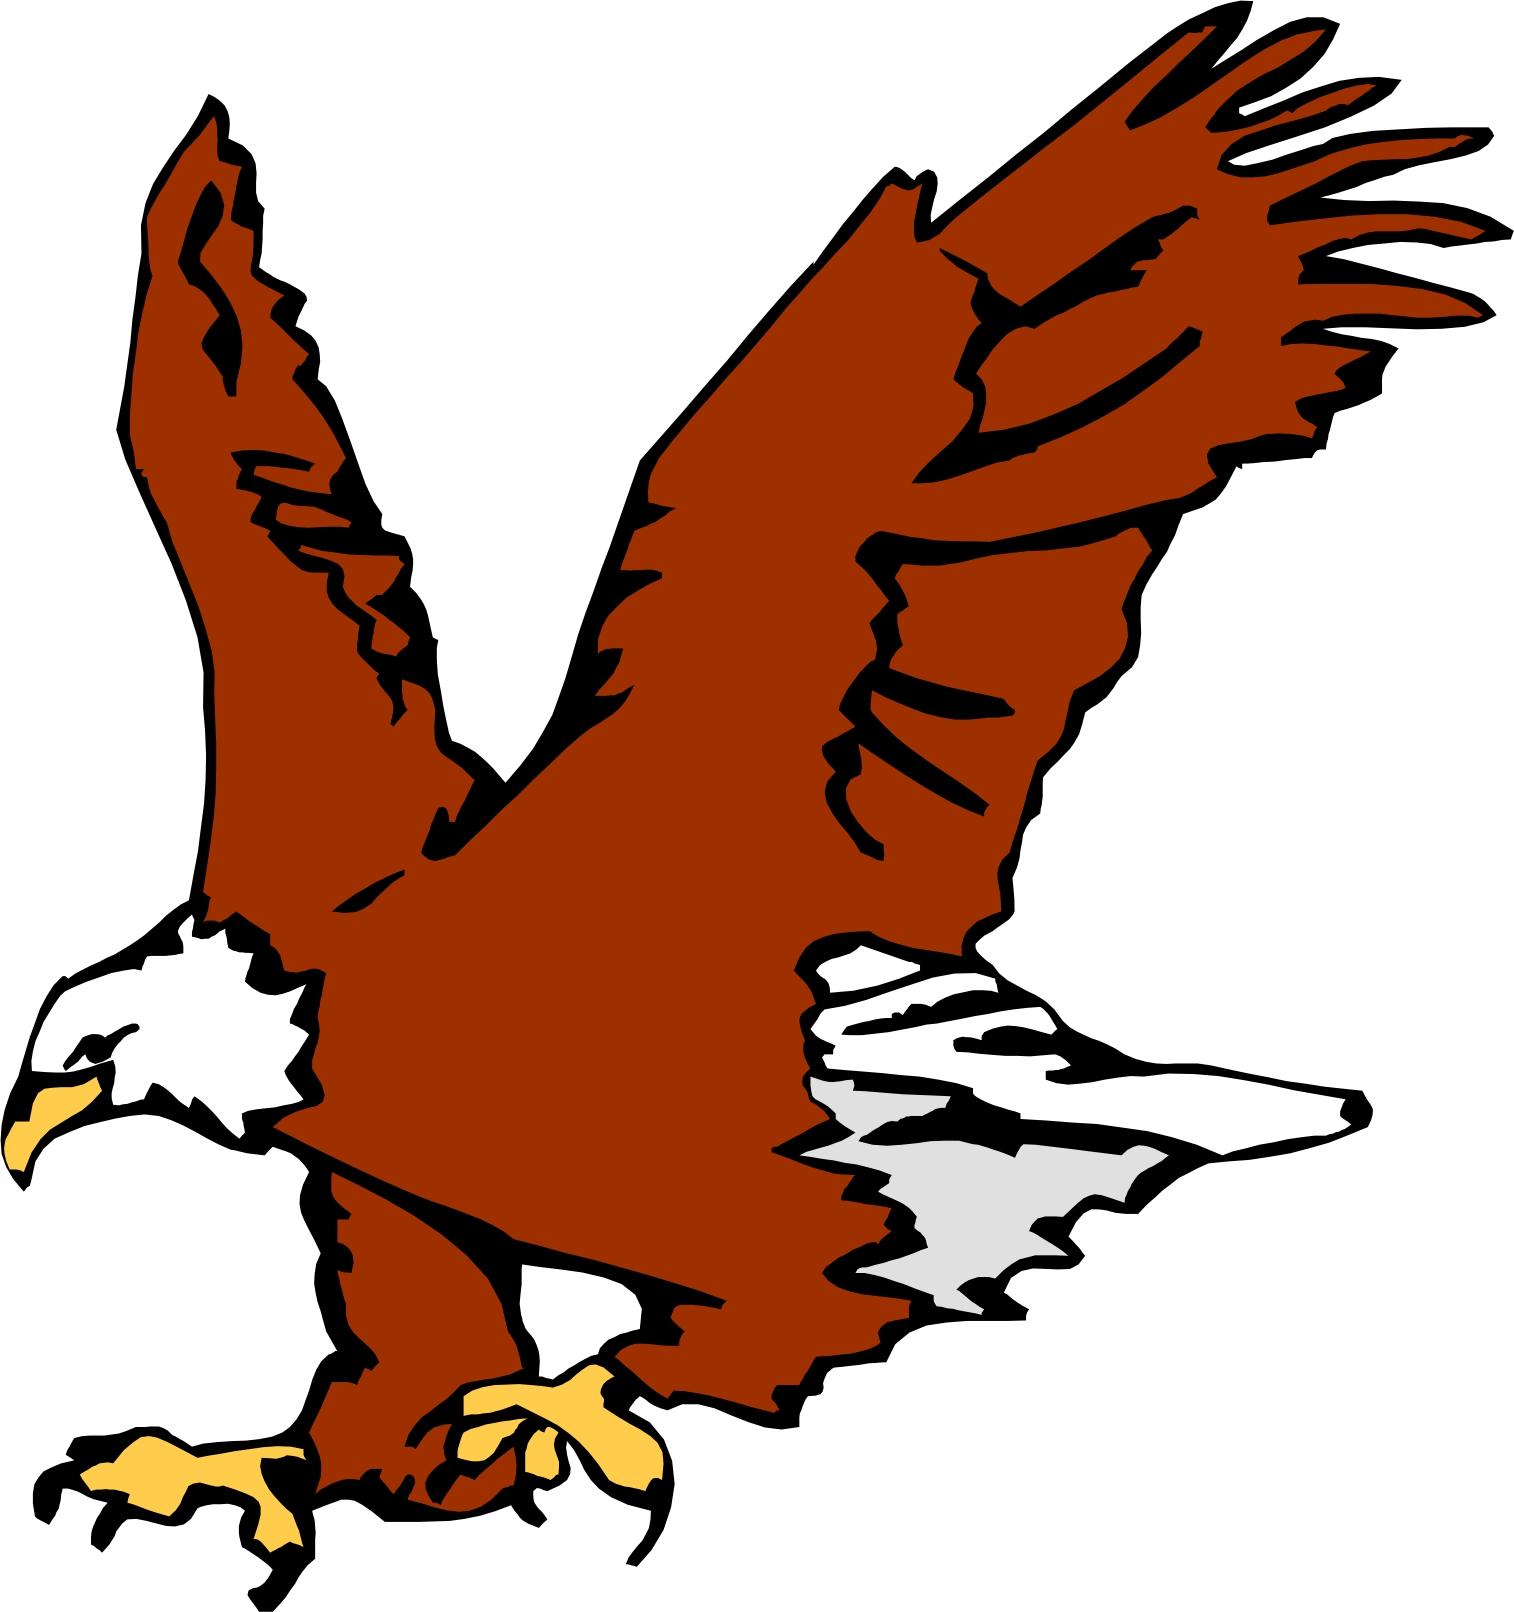 Cartoon eagle clipart.